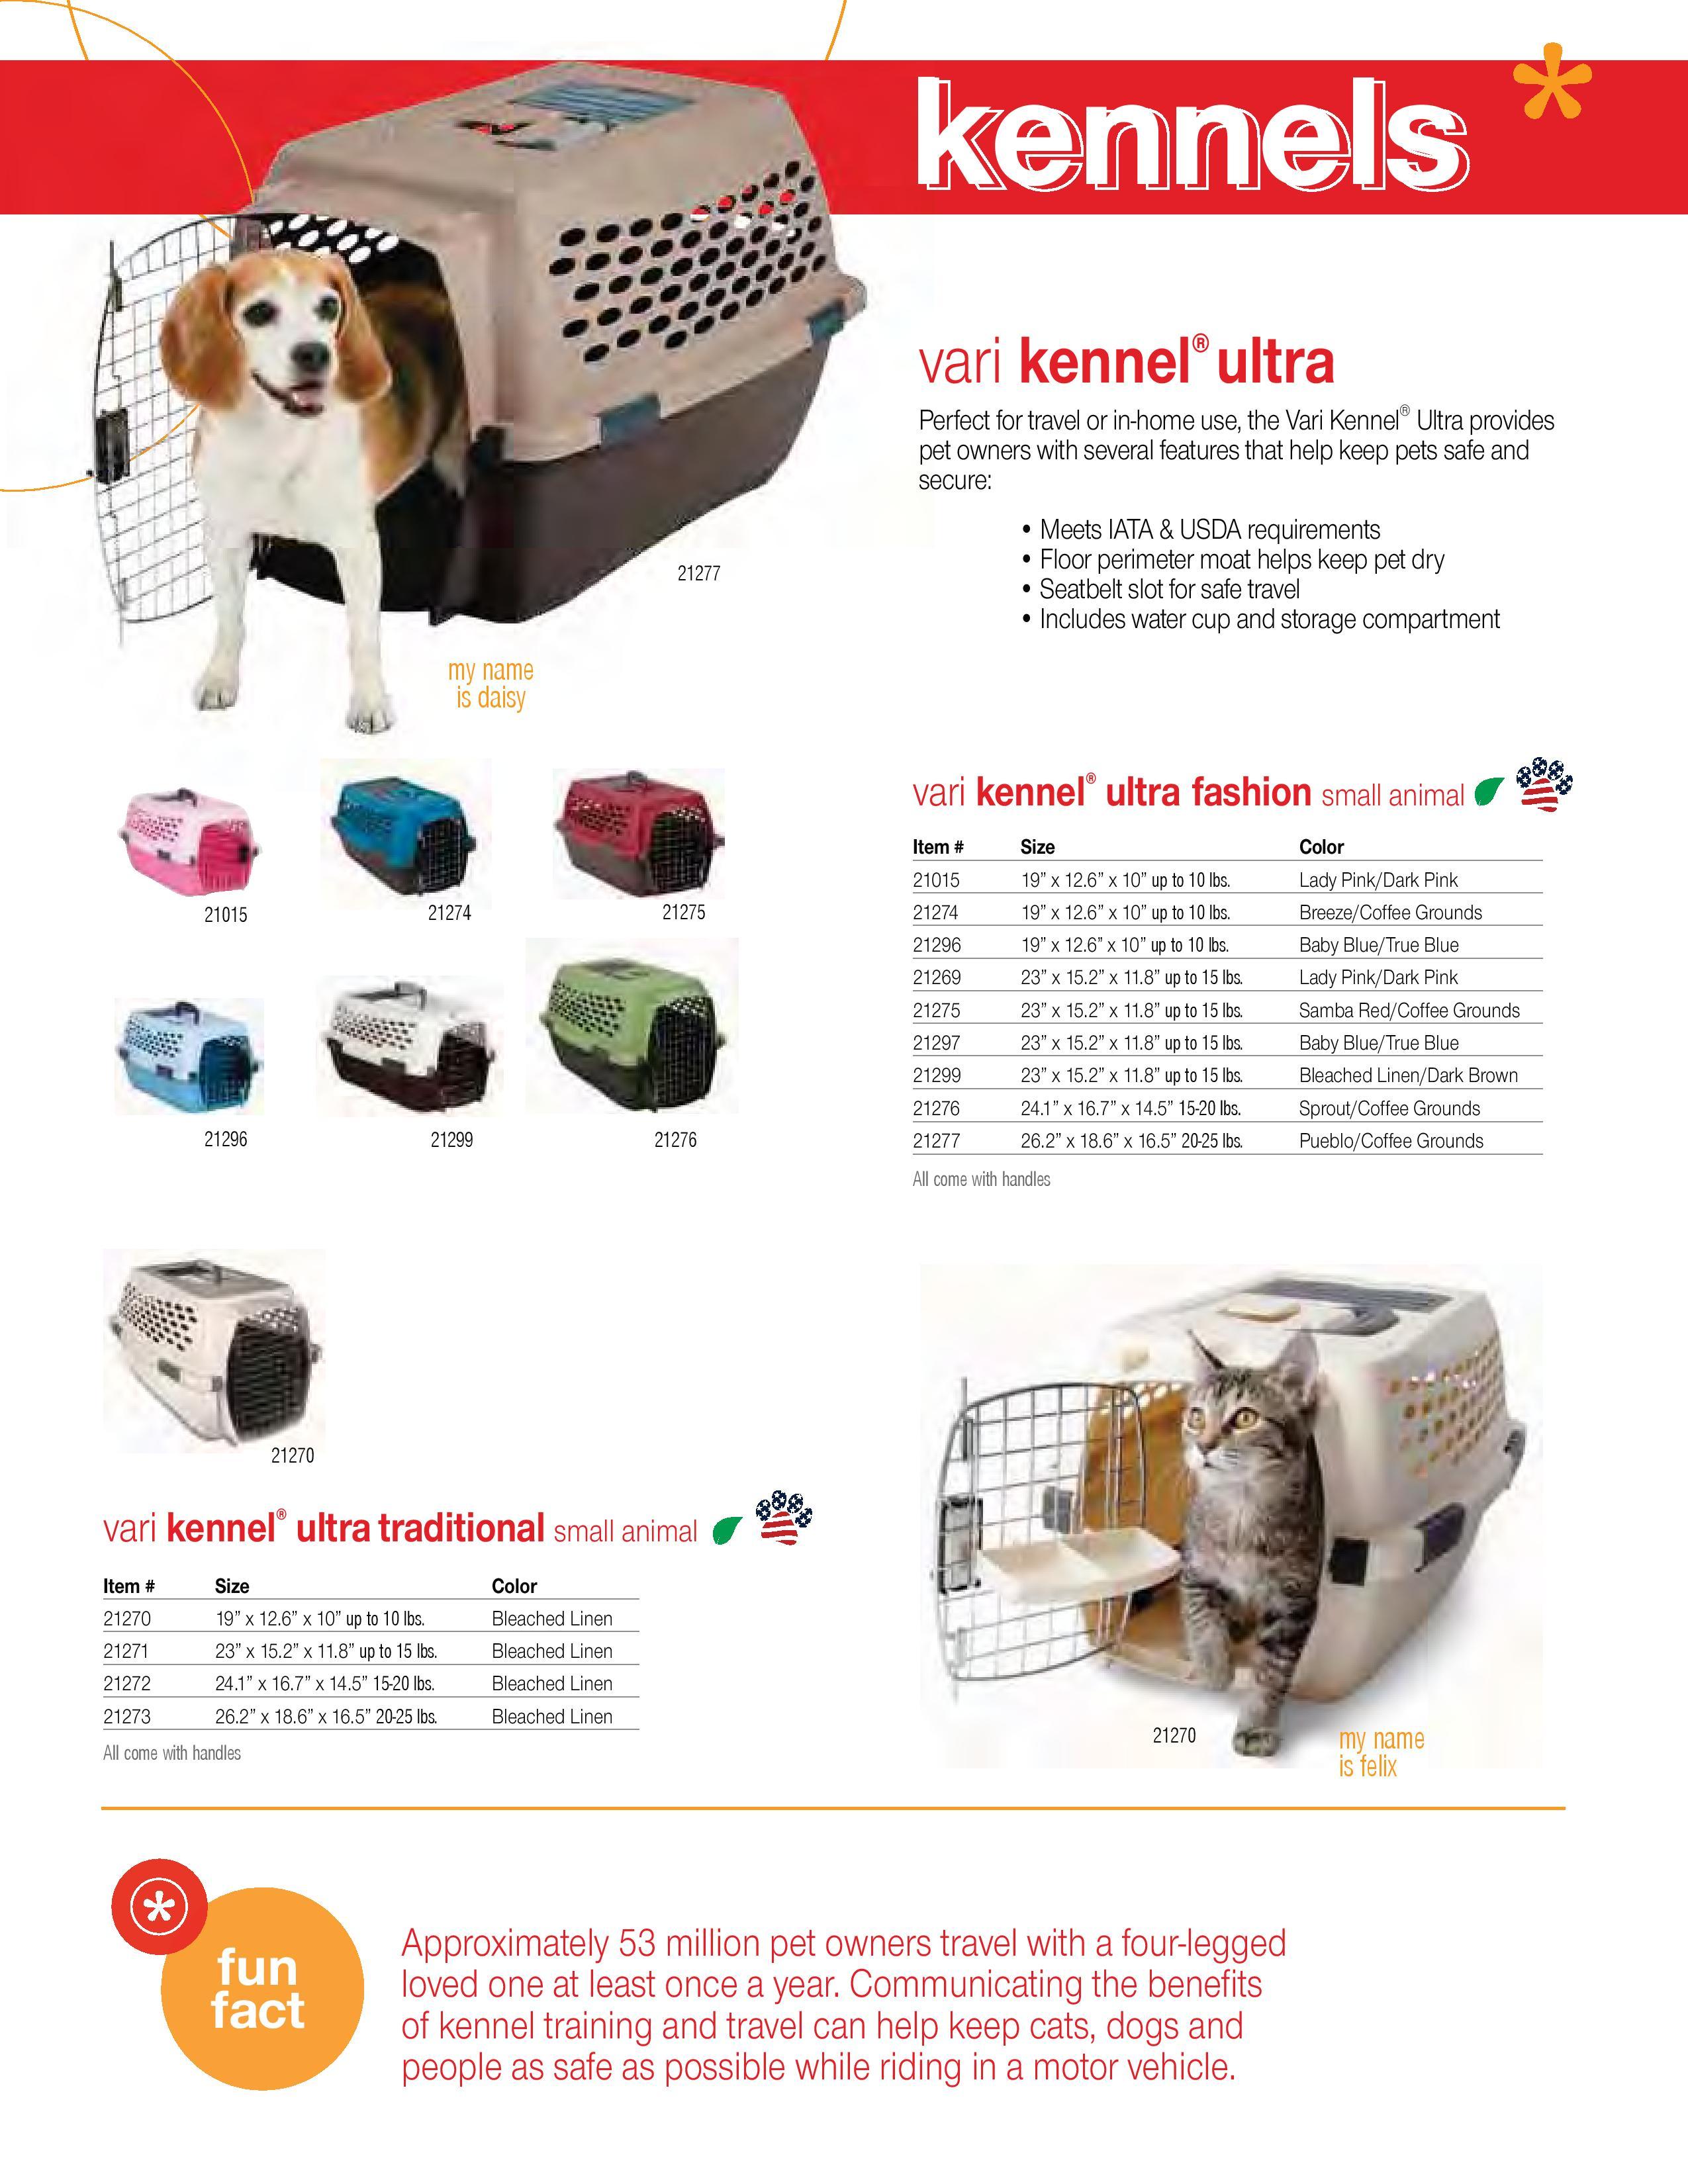 Emirtaes Animals Export 1 (14)